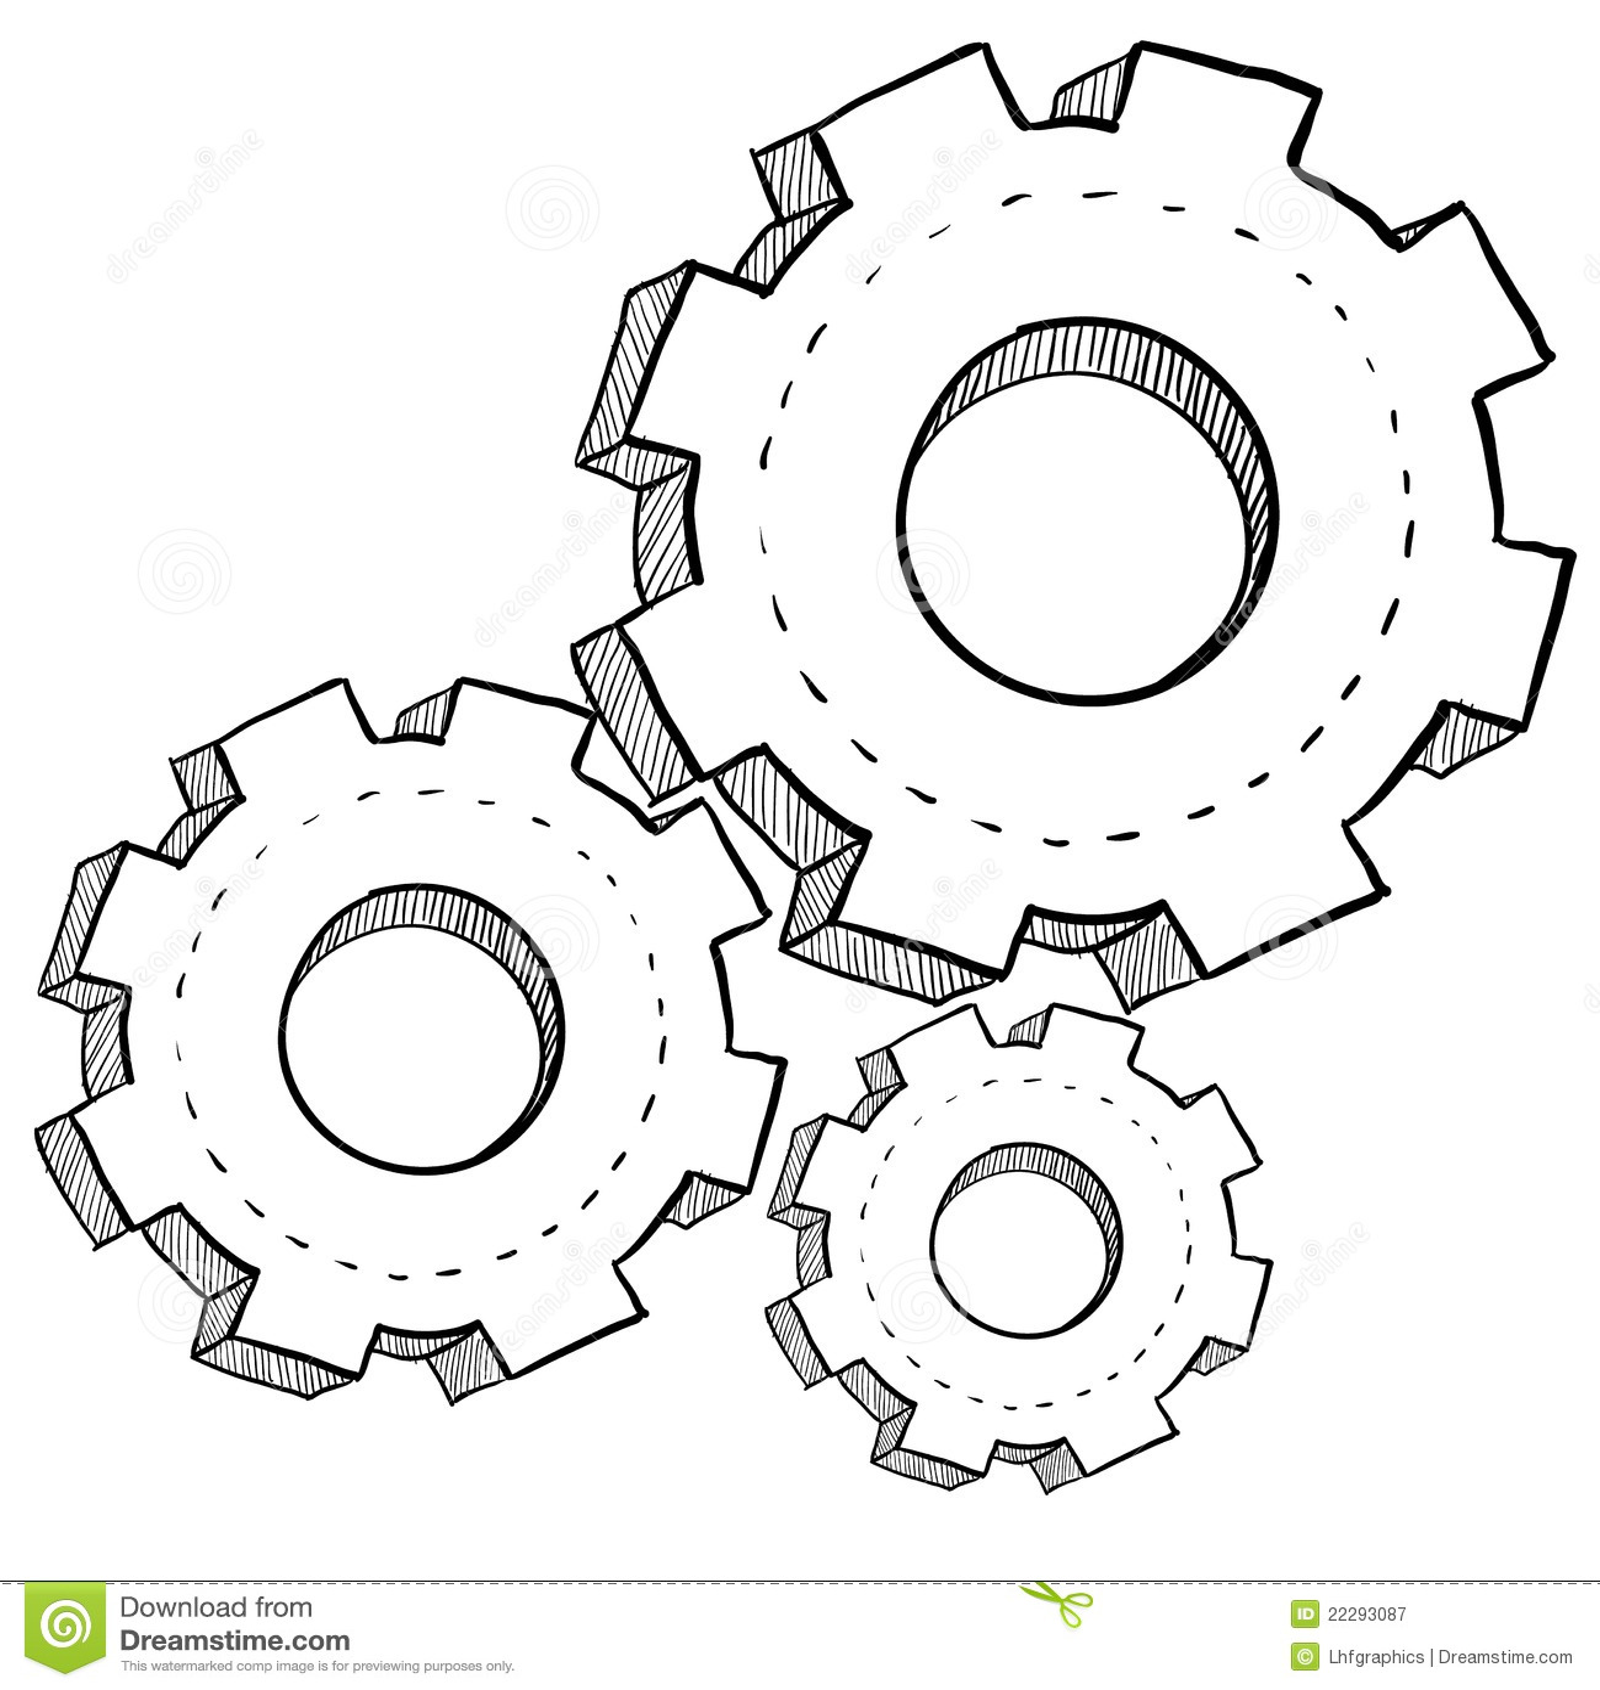 Gear, Mechanics, Or Settings Illustration Stock Vector